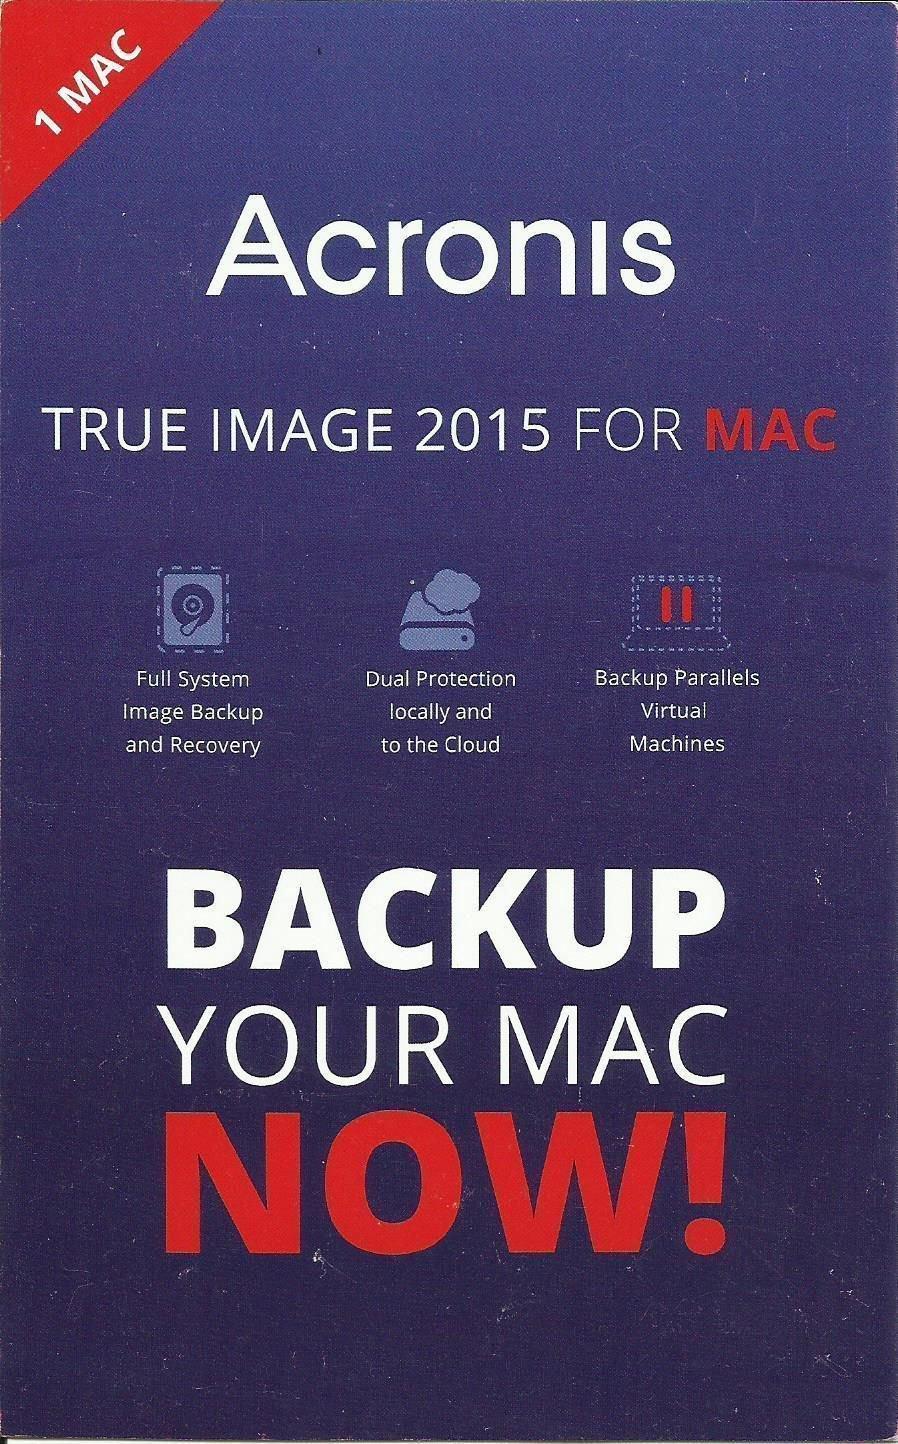 Acronis True Image 2015 for Mac (1 user)